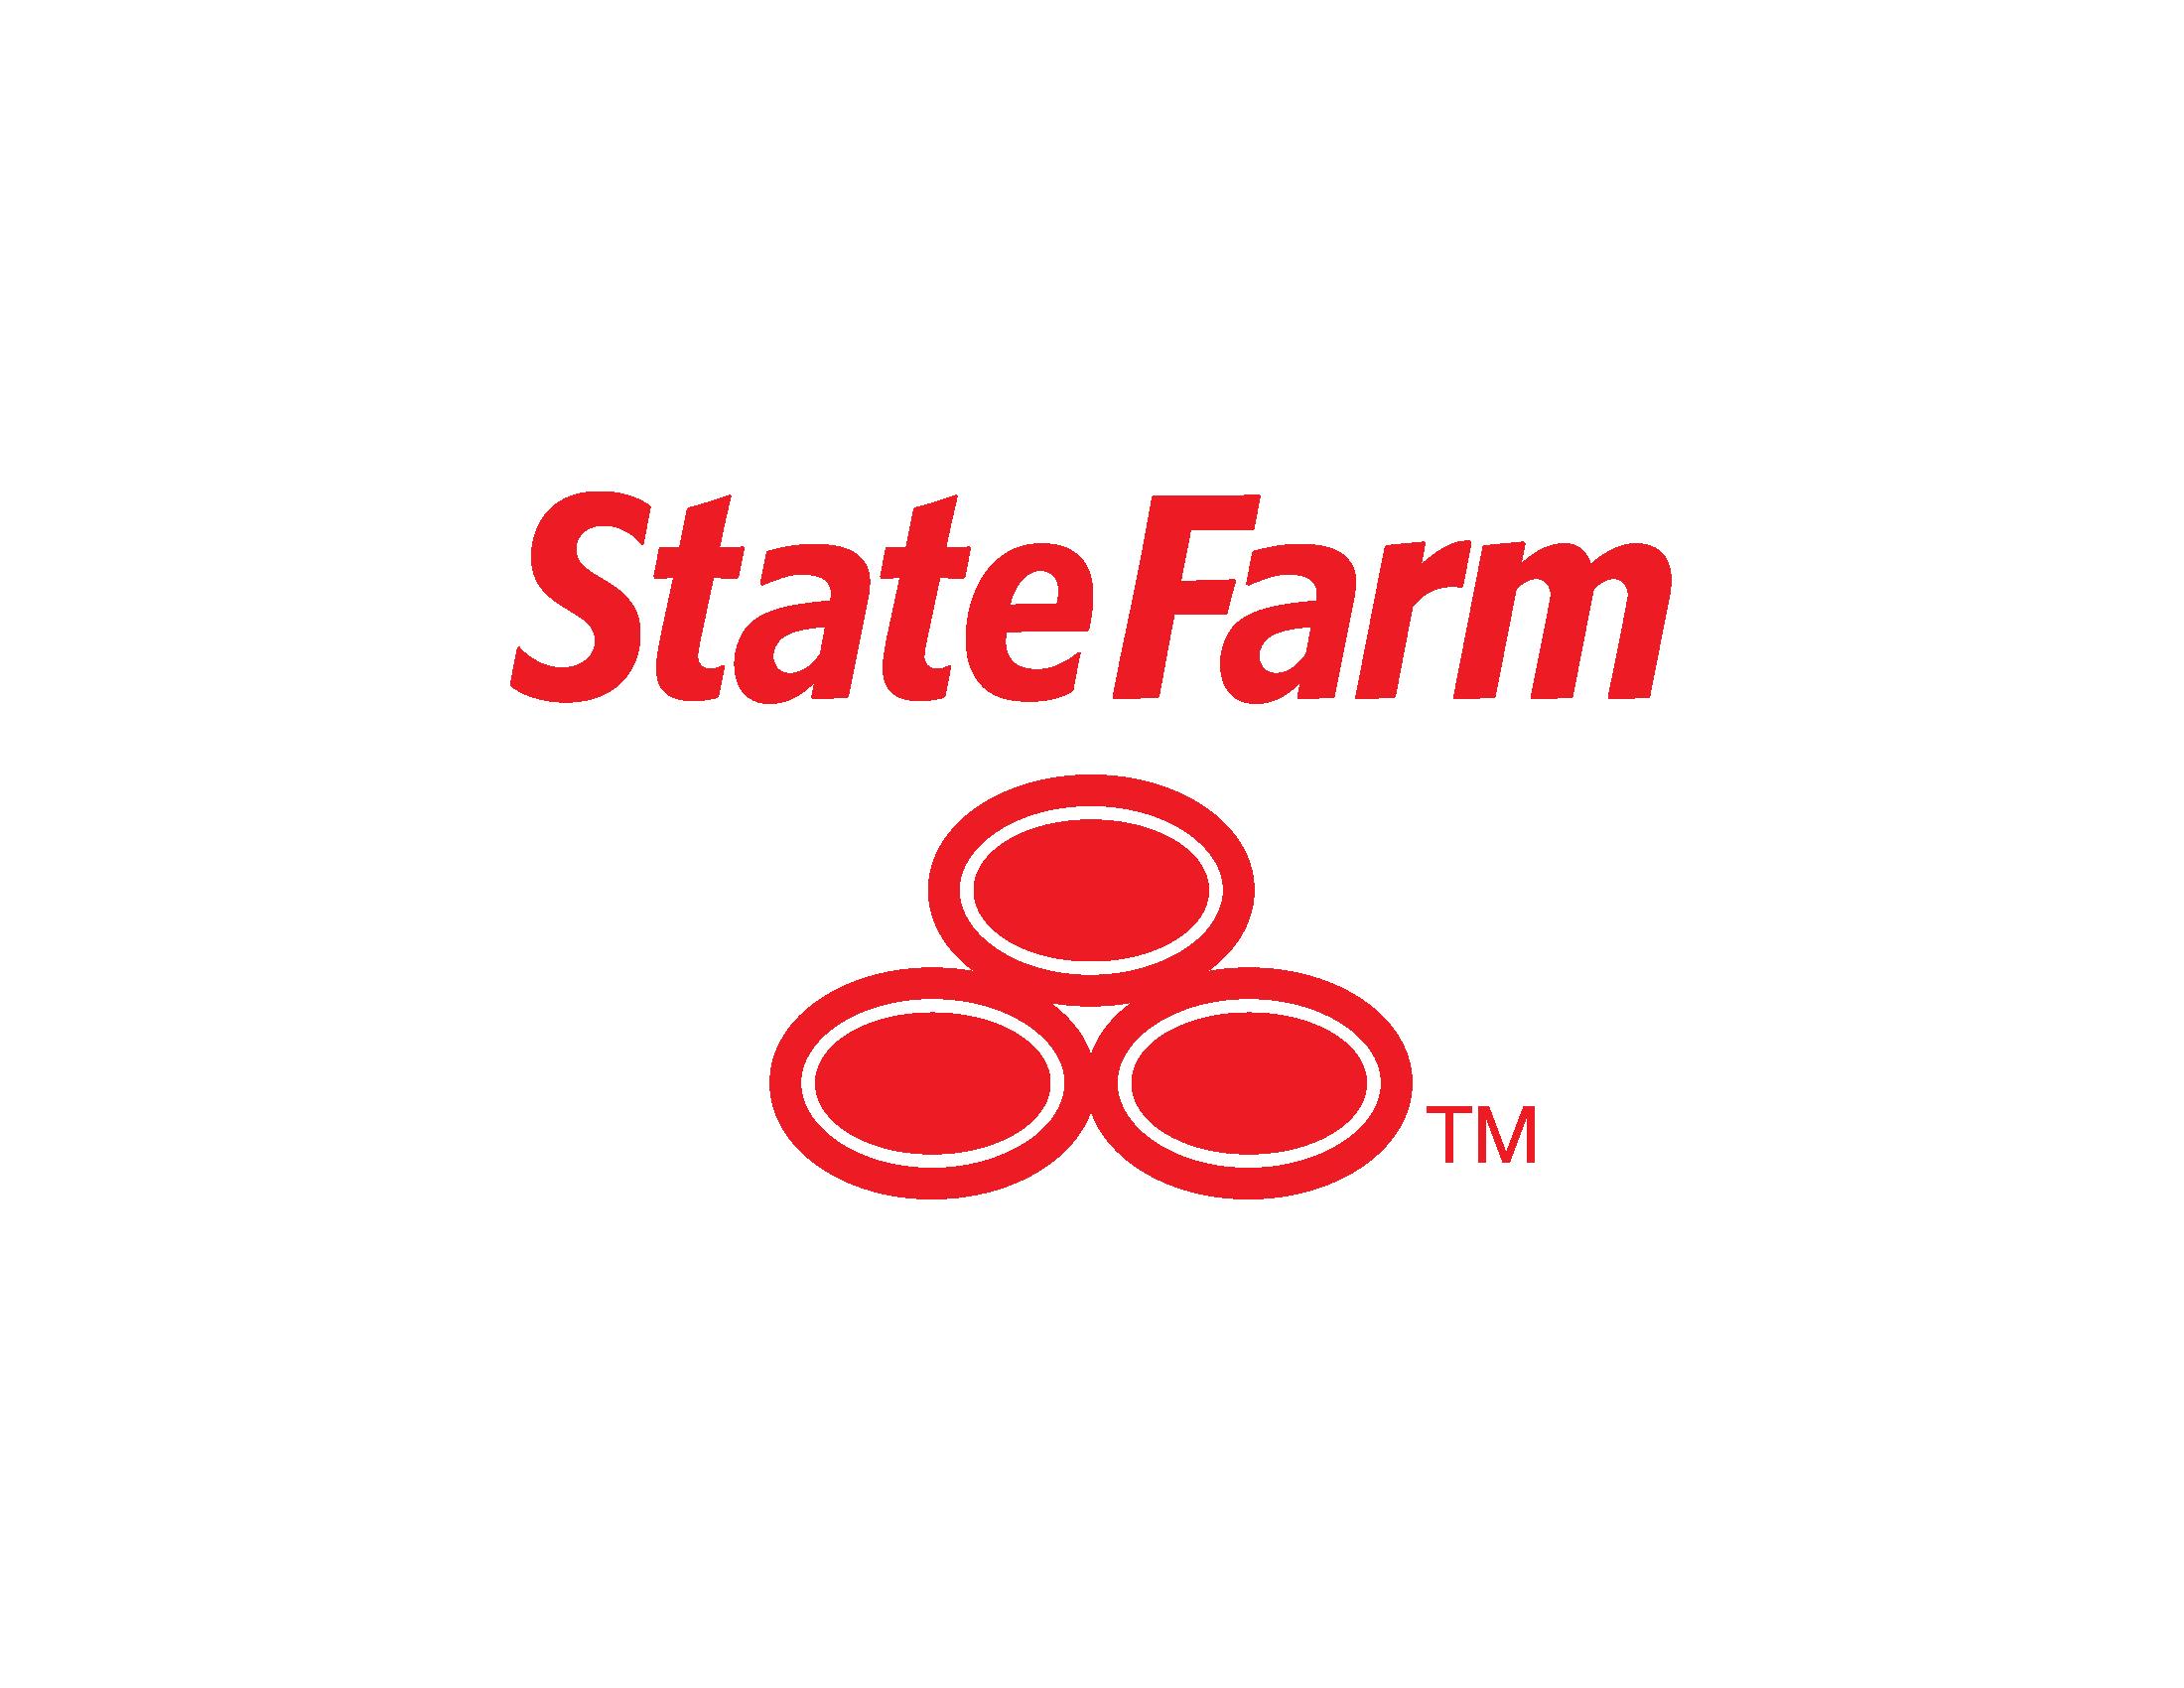 State Farm Logo Image | Affordable Car Insurance